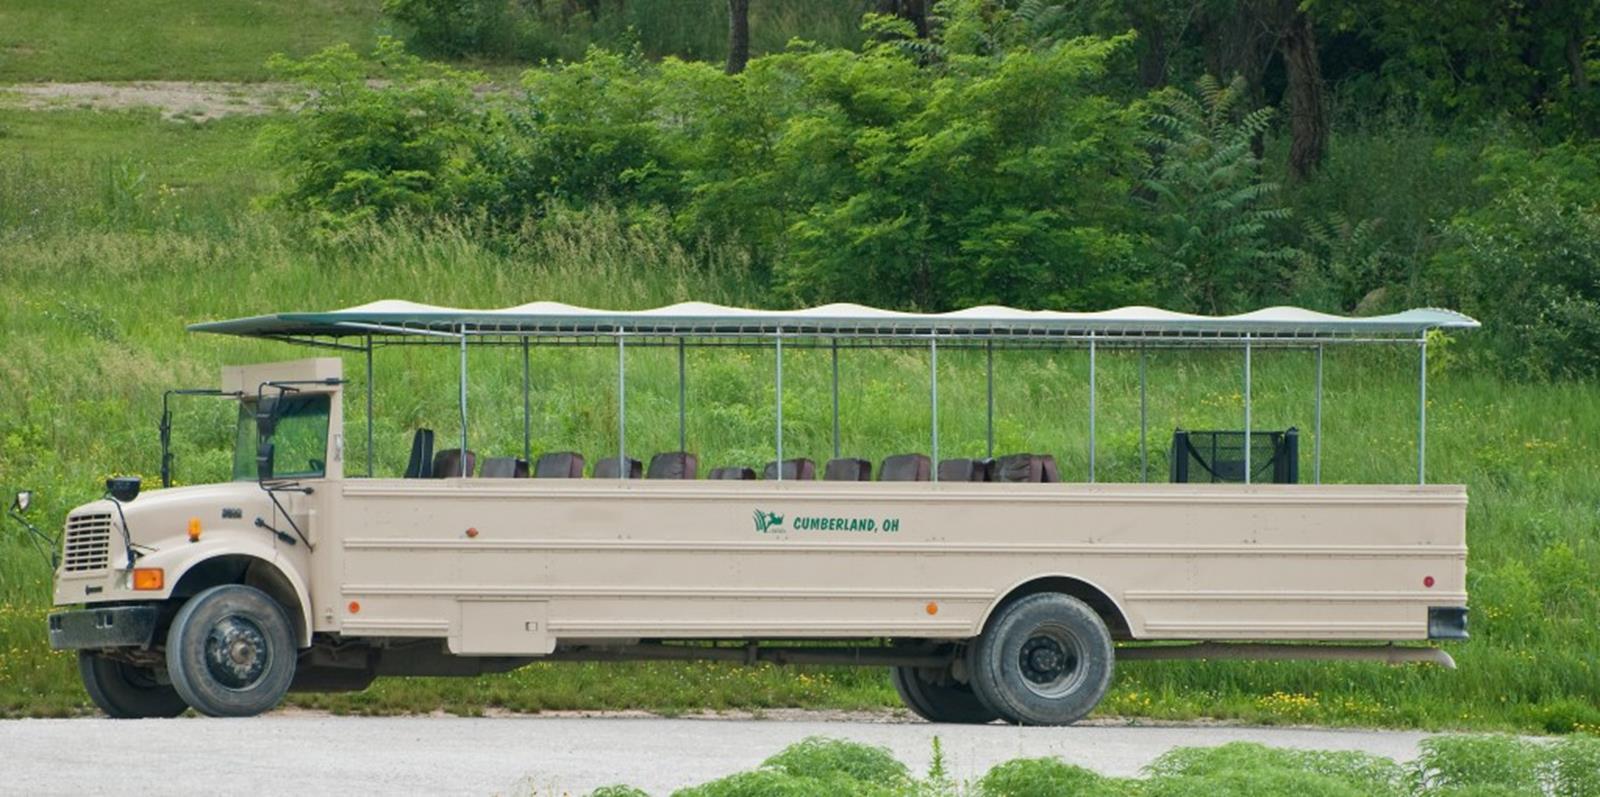 The Wilds Safari Bus